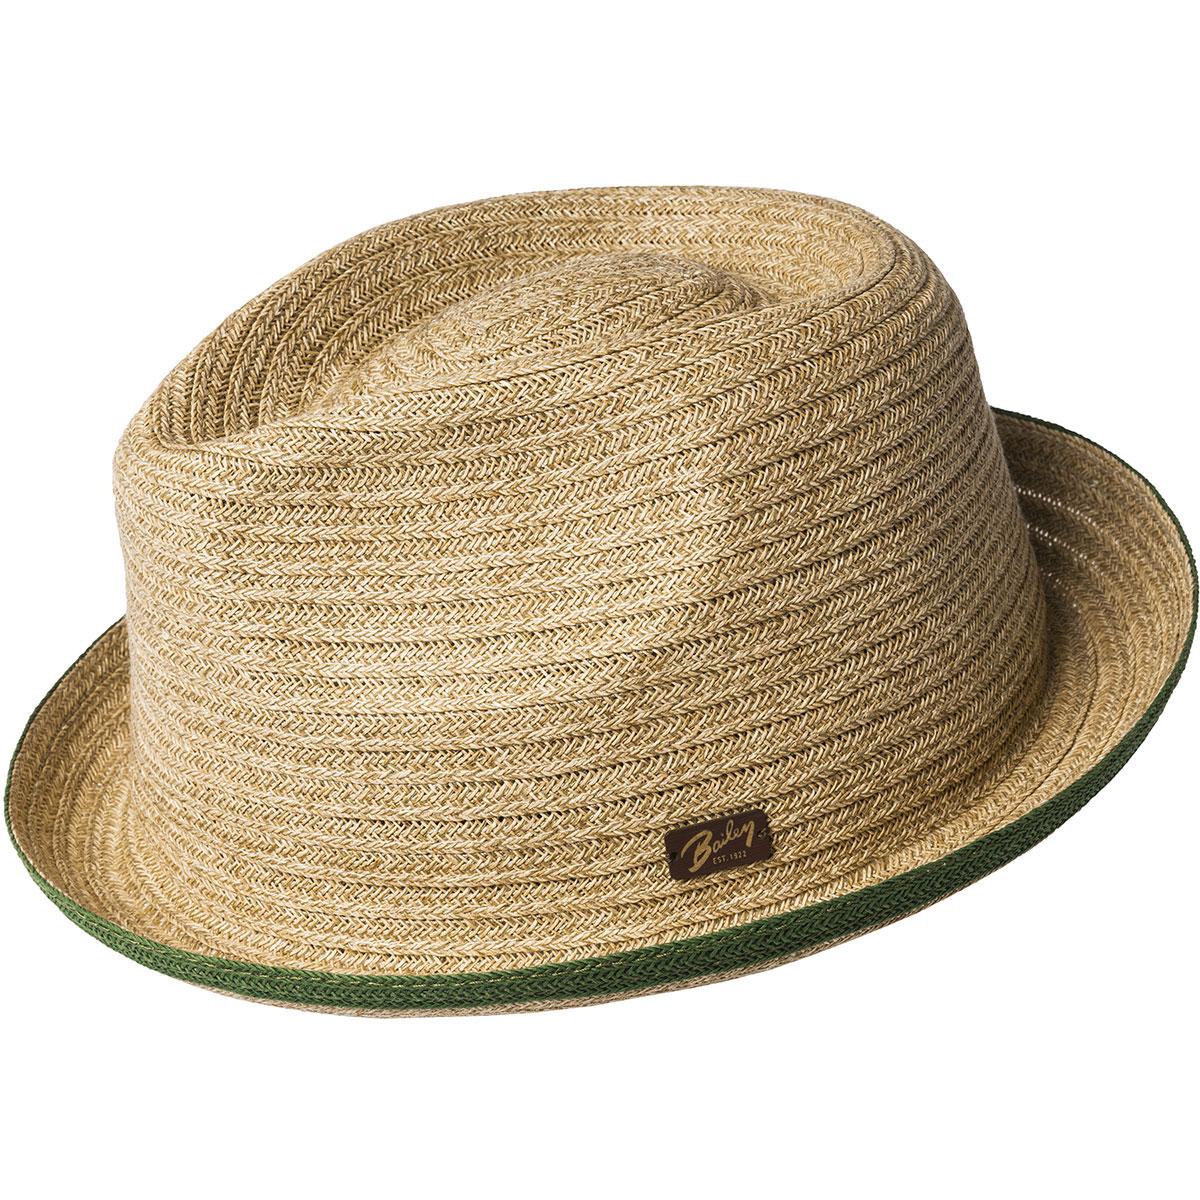 Men's Vintage Style Hats, Retro Hats Noakes Trilby $78.00 AT vintagedancer.com